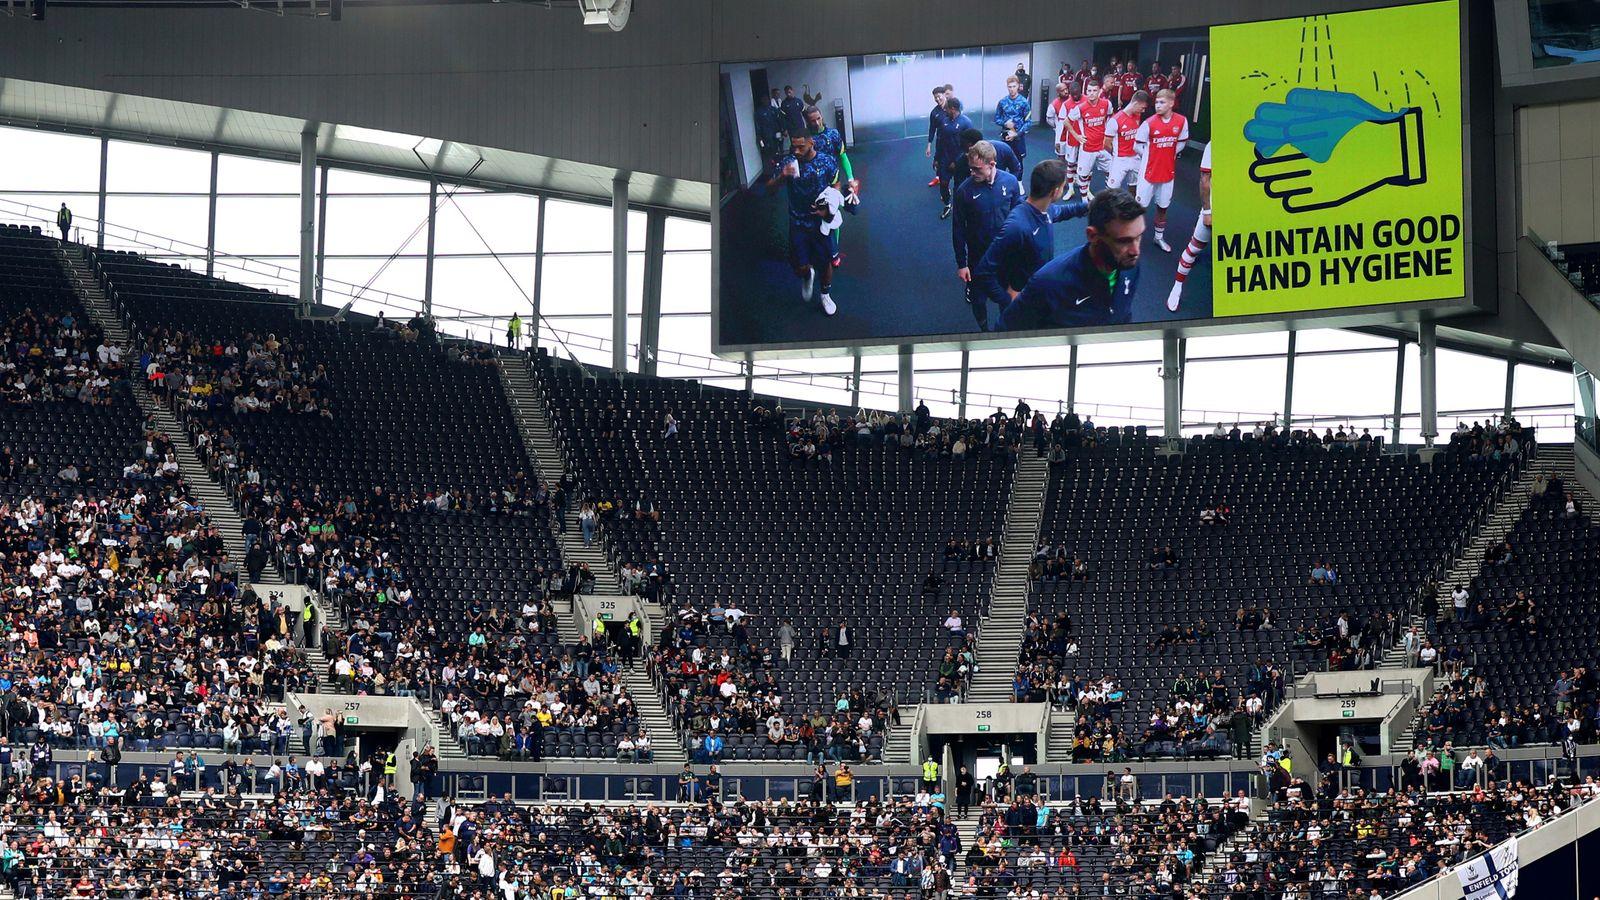 Coronavirus: Premier League announces fans subject to random spot checks on Covid-19 status